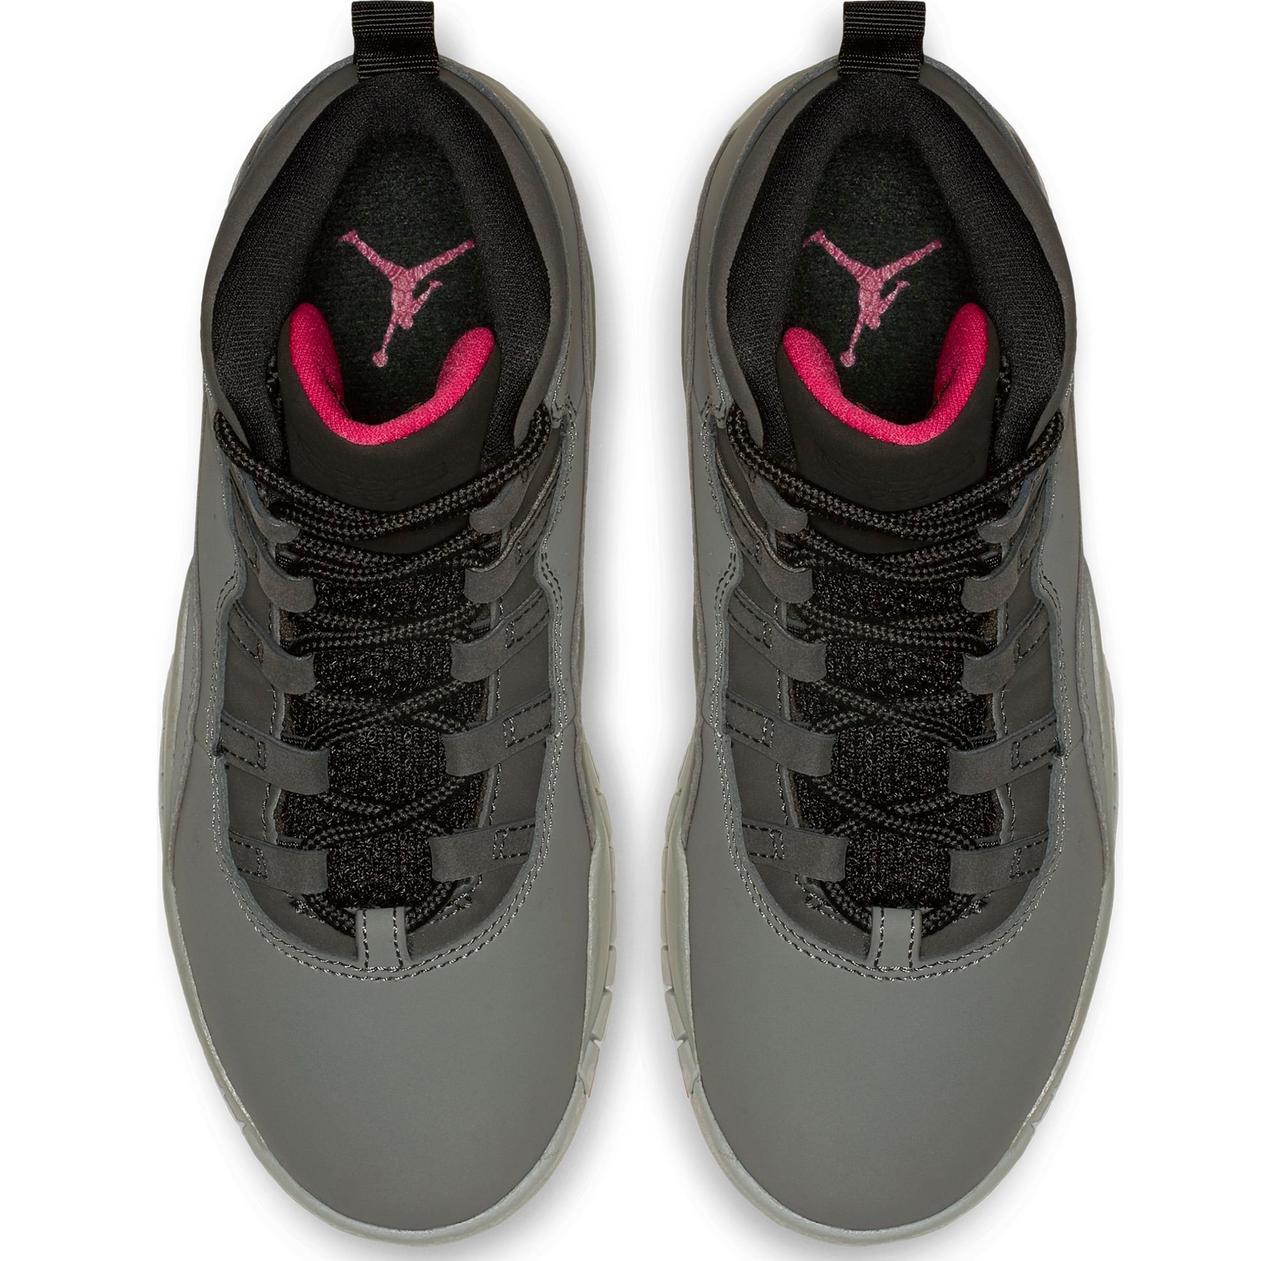 ff476d06c06eaa Sneaker Release  Kids Air Jordan Retro 10